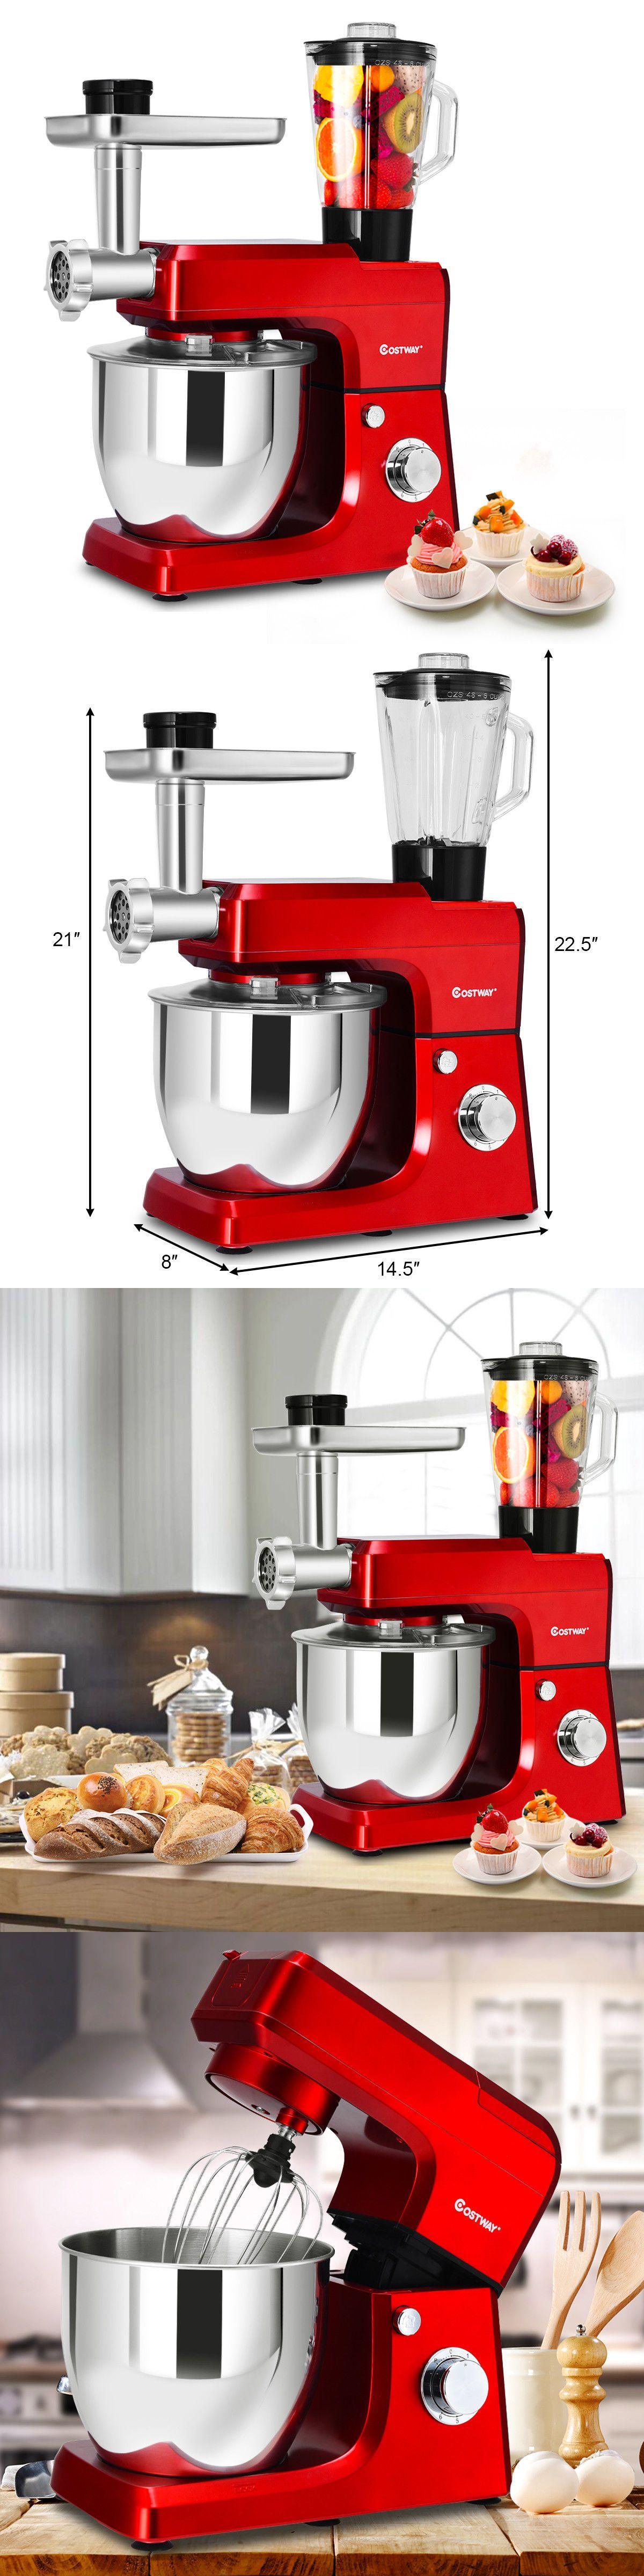 kitchenaid mixer k45ss accessories